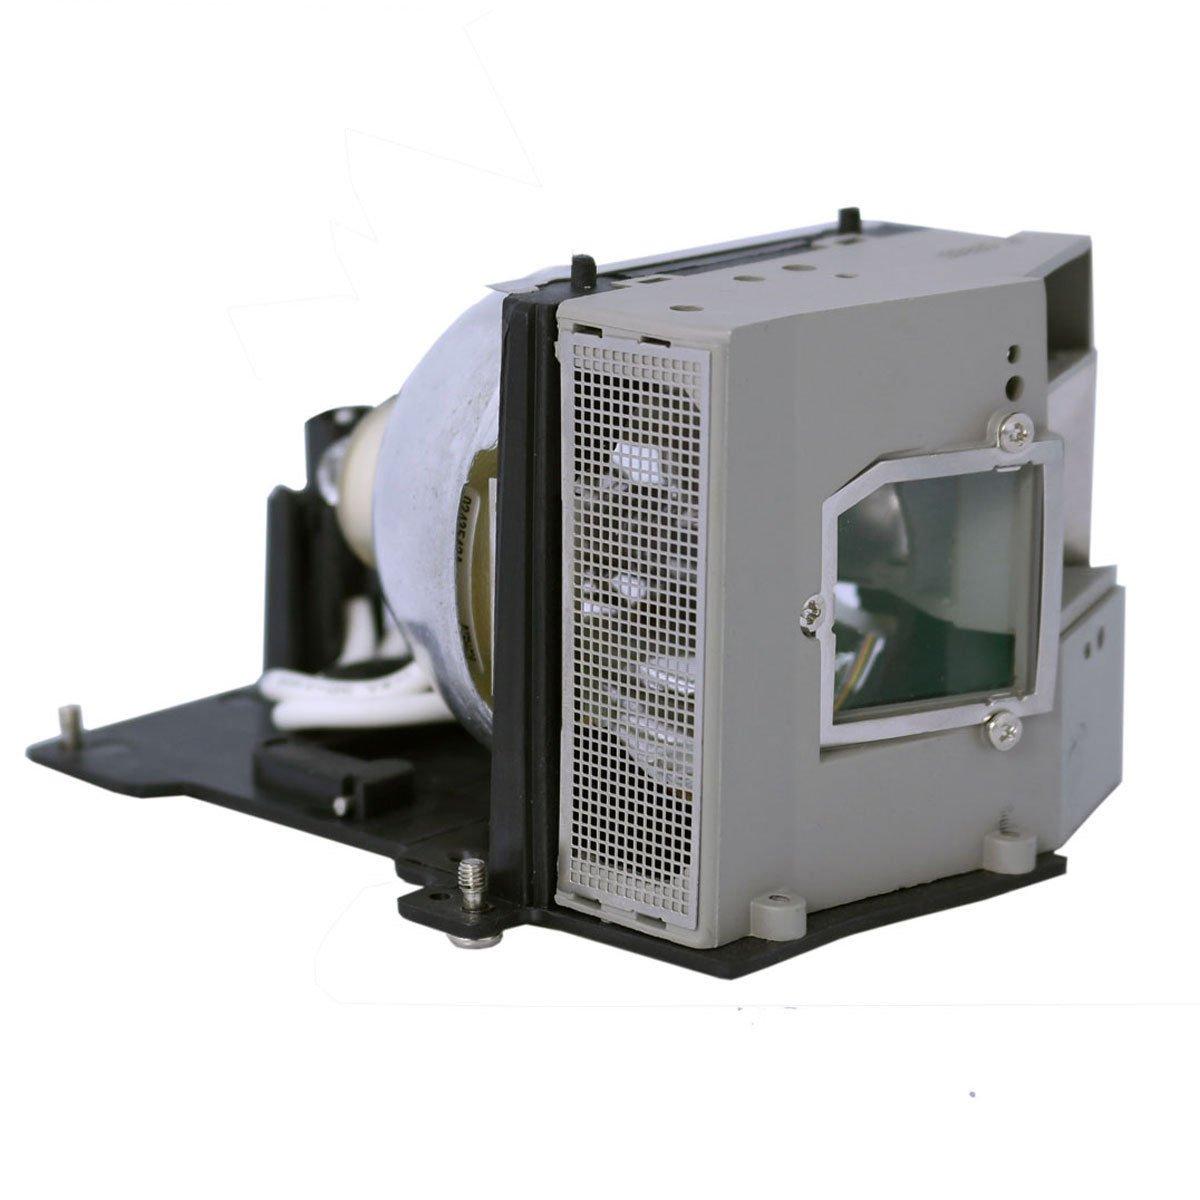 Supermait BL-FP300A / SP.85Y01G.C01 プロジェクター交換用ランプ 純正OEMバルブ + 汎用ハウジング 180日間安心保証つき 適用機種: EP780 / EP781 / TX780 対応   B078TZ7VSL